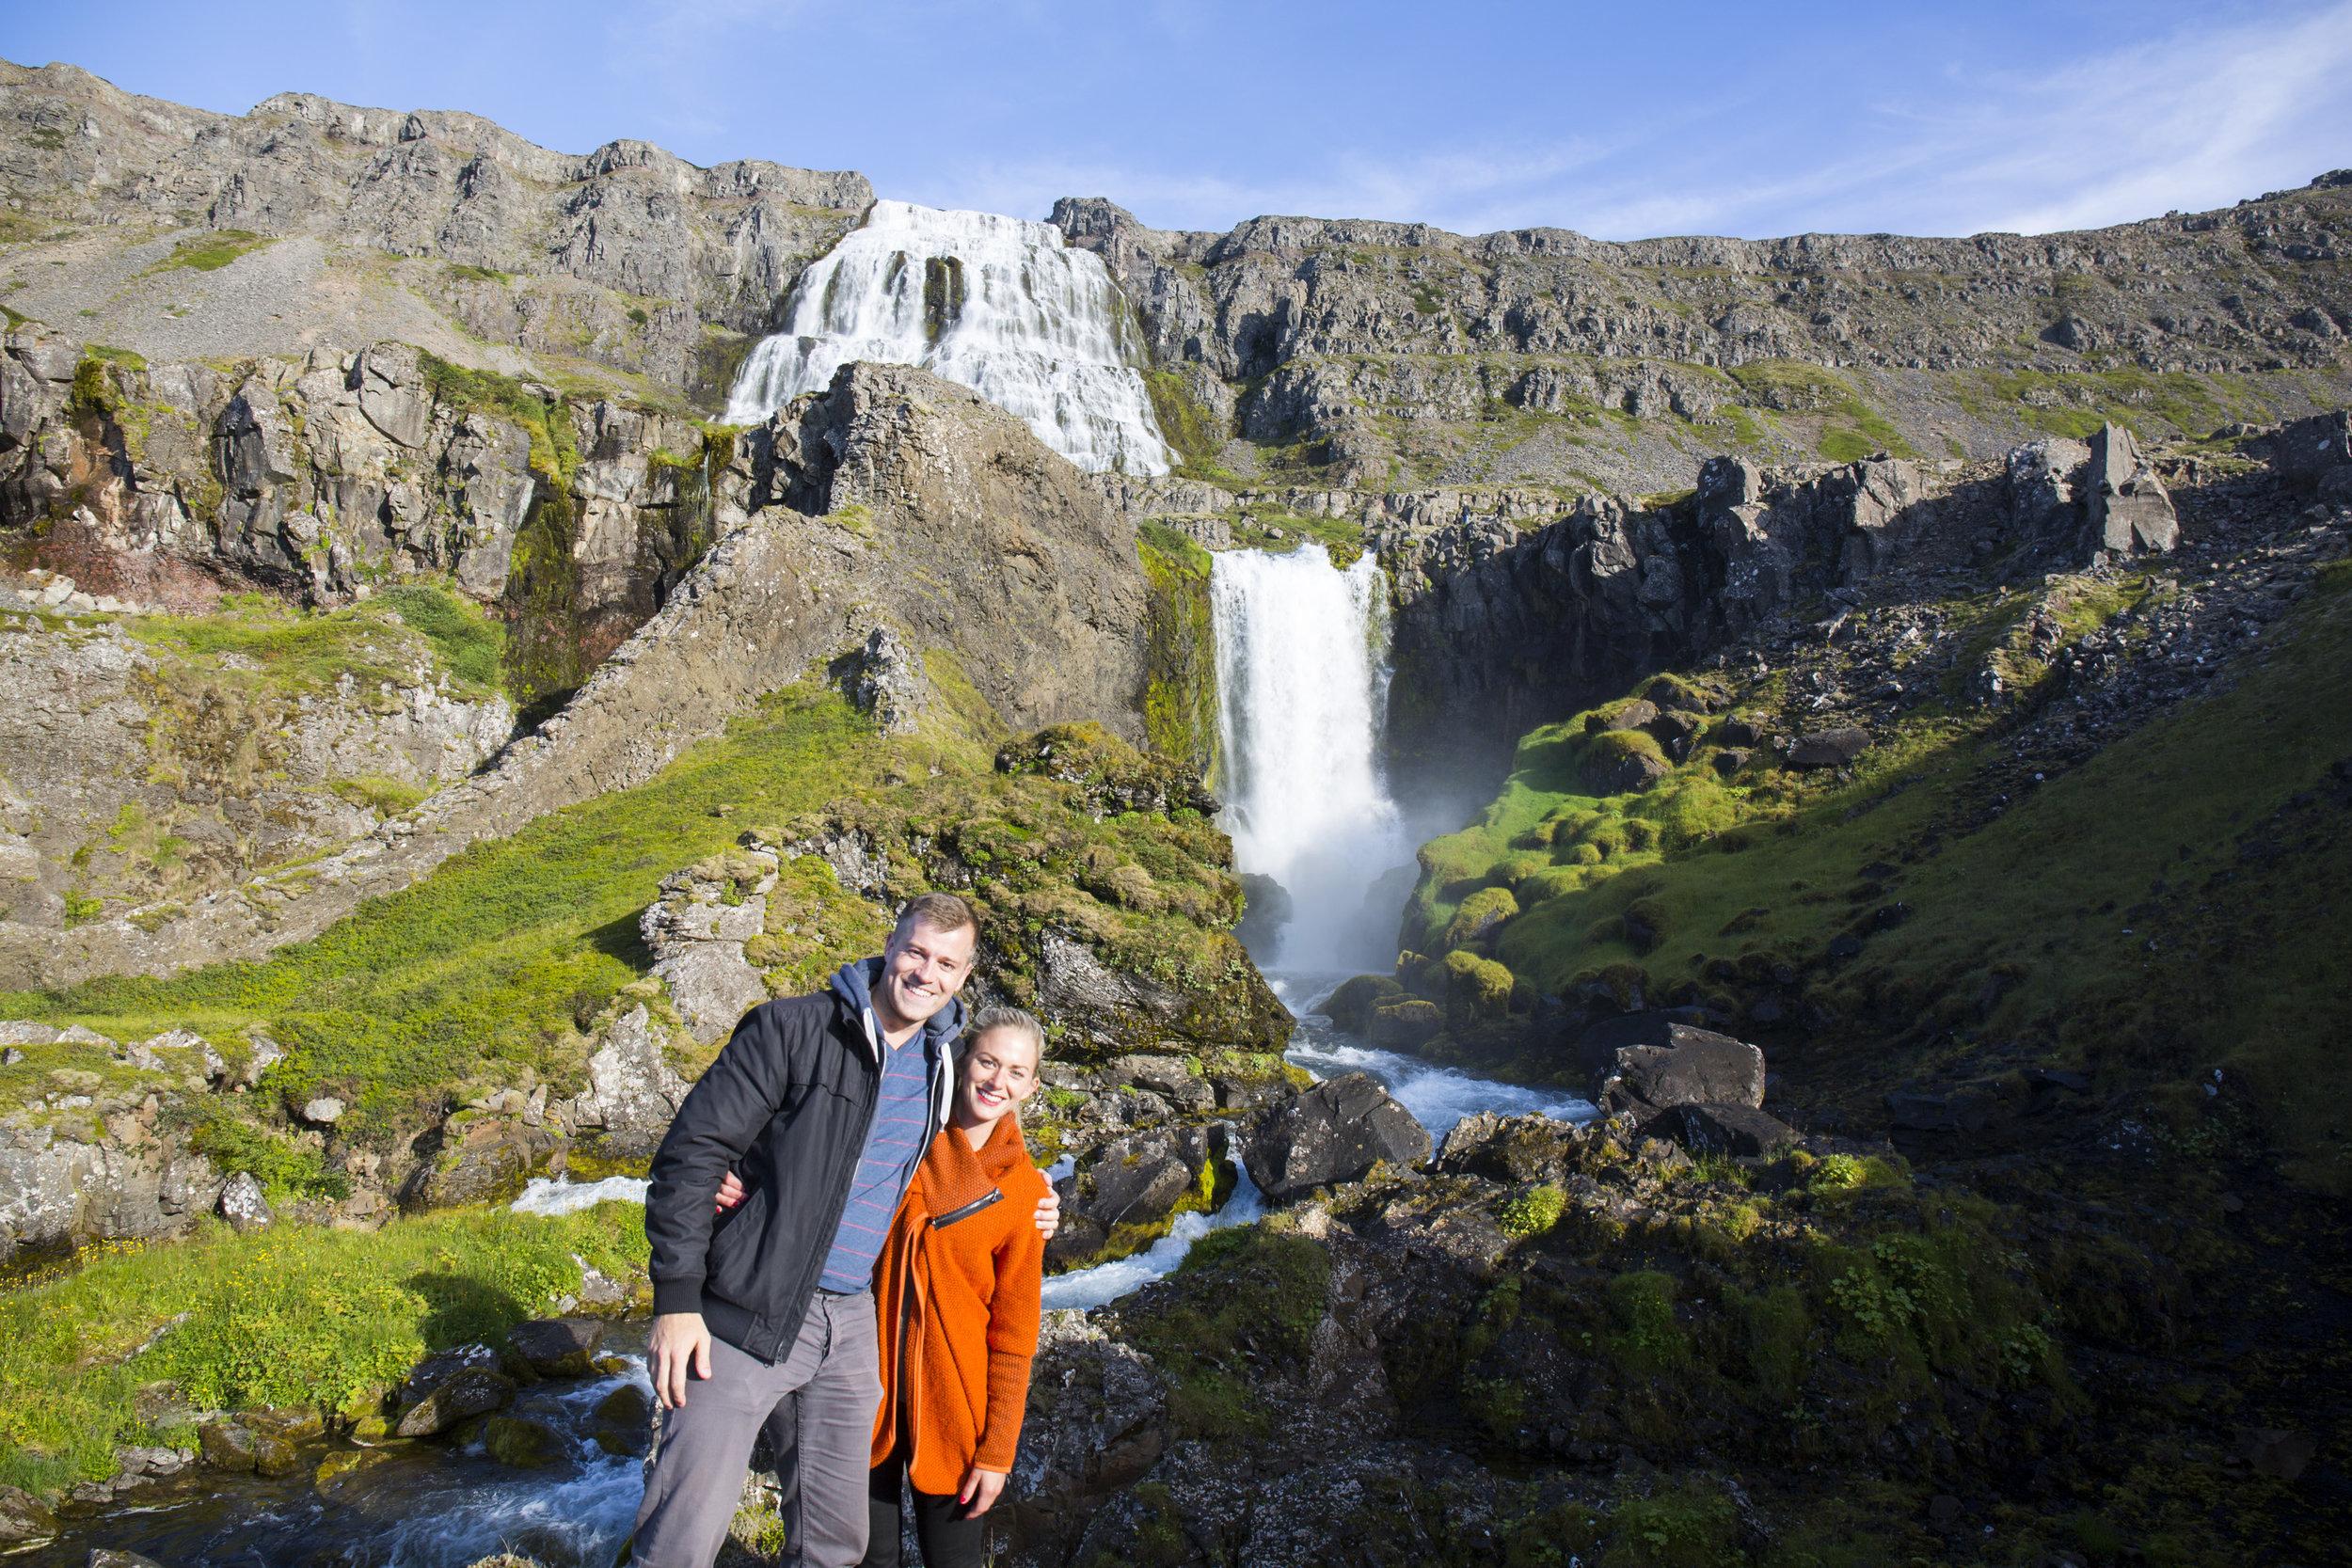 Kaelene and her viking in the Westfjords. Photo by  Kaelene .